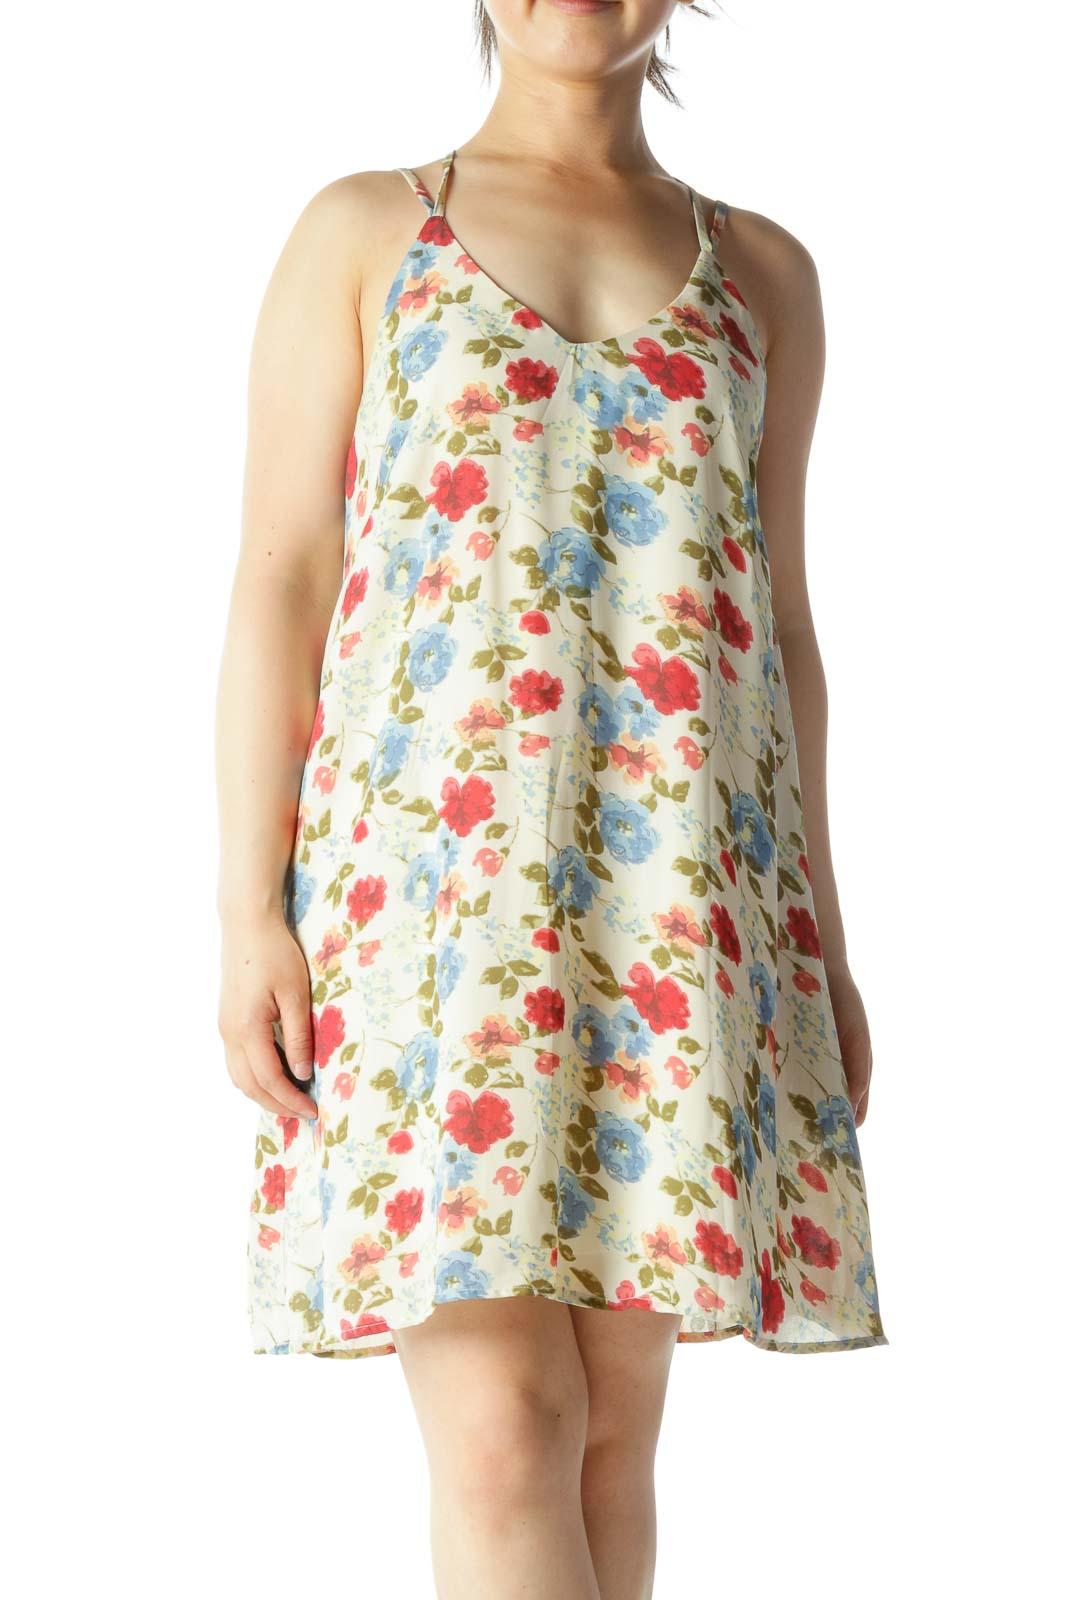 Blue Beige Red Floral-Print V-Neck Spaghetti Strap Day Dress Front